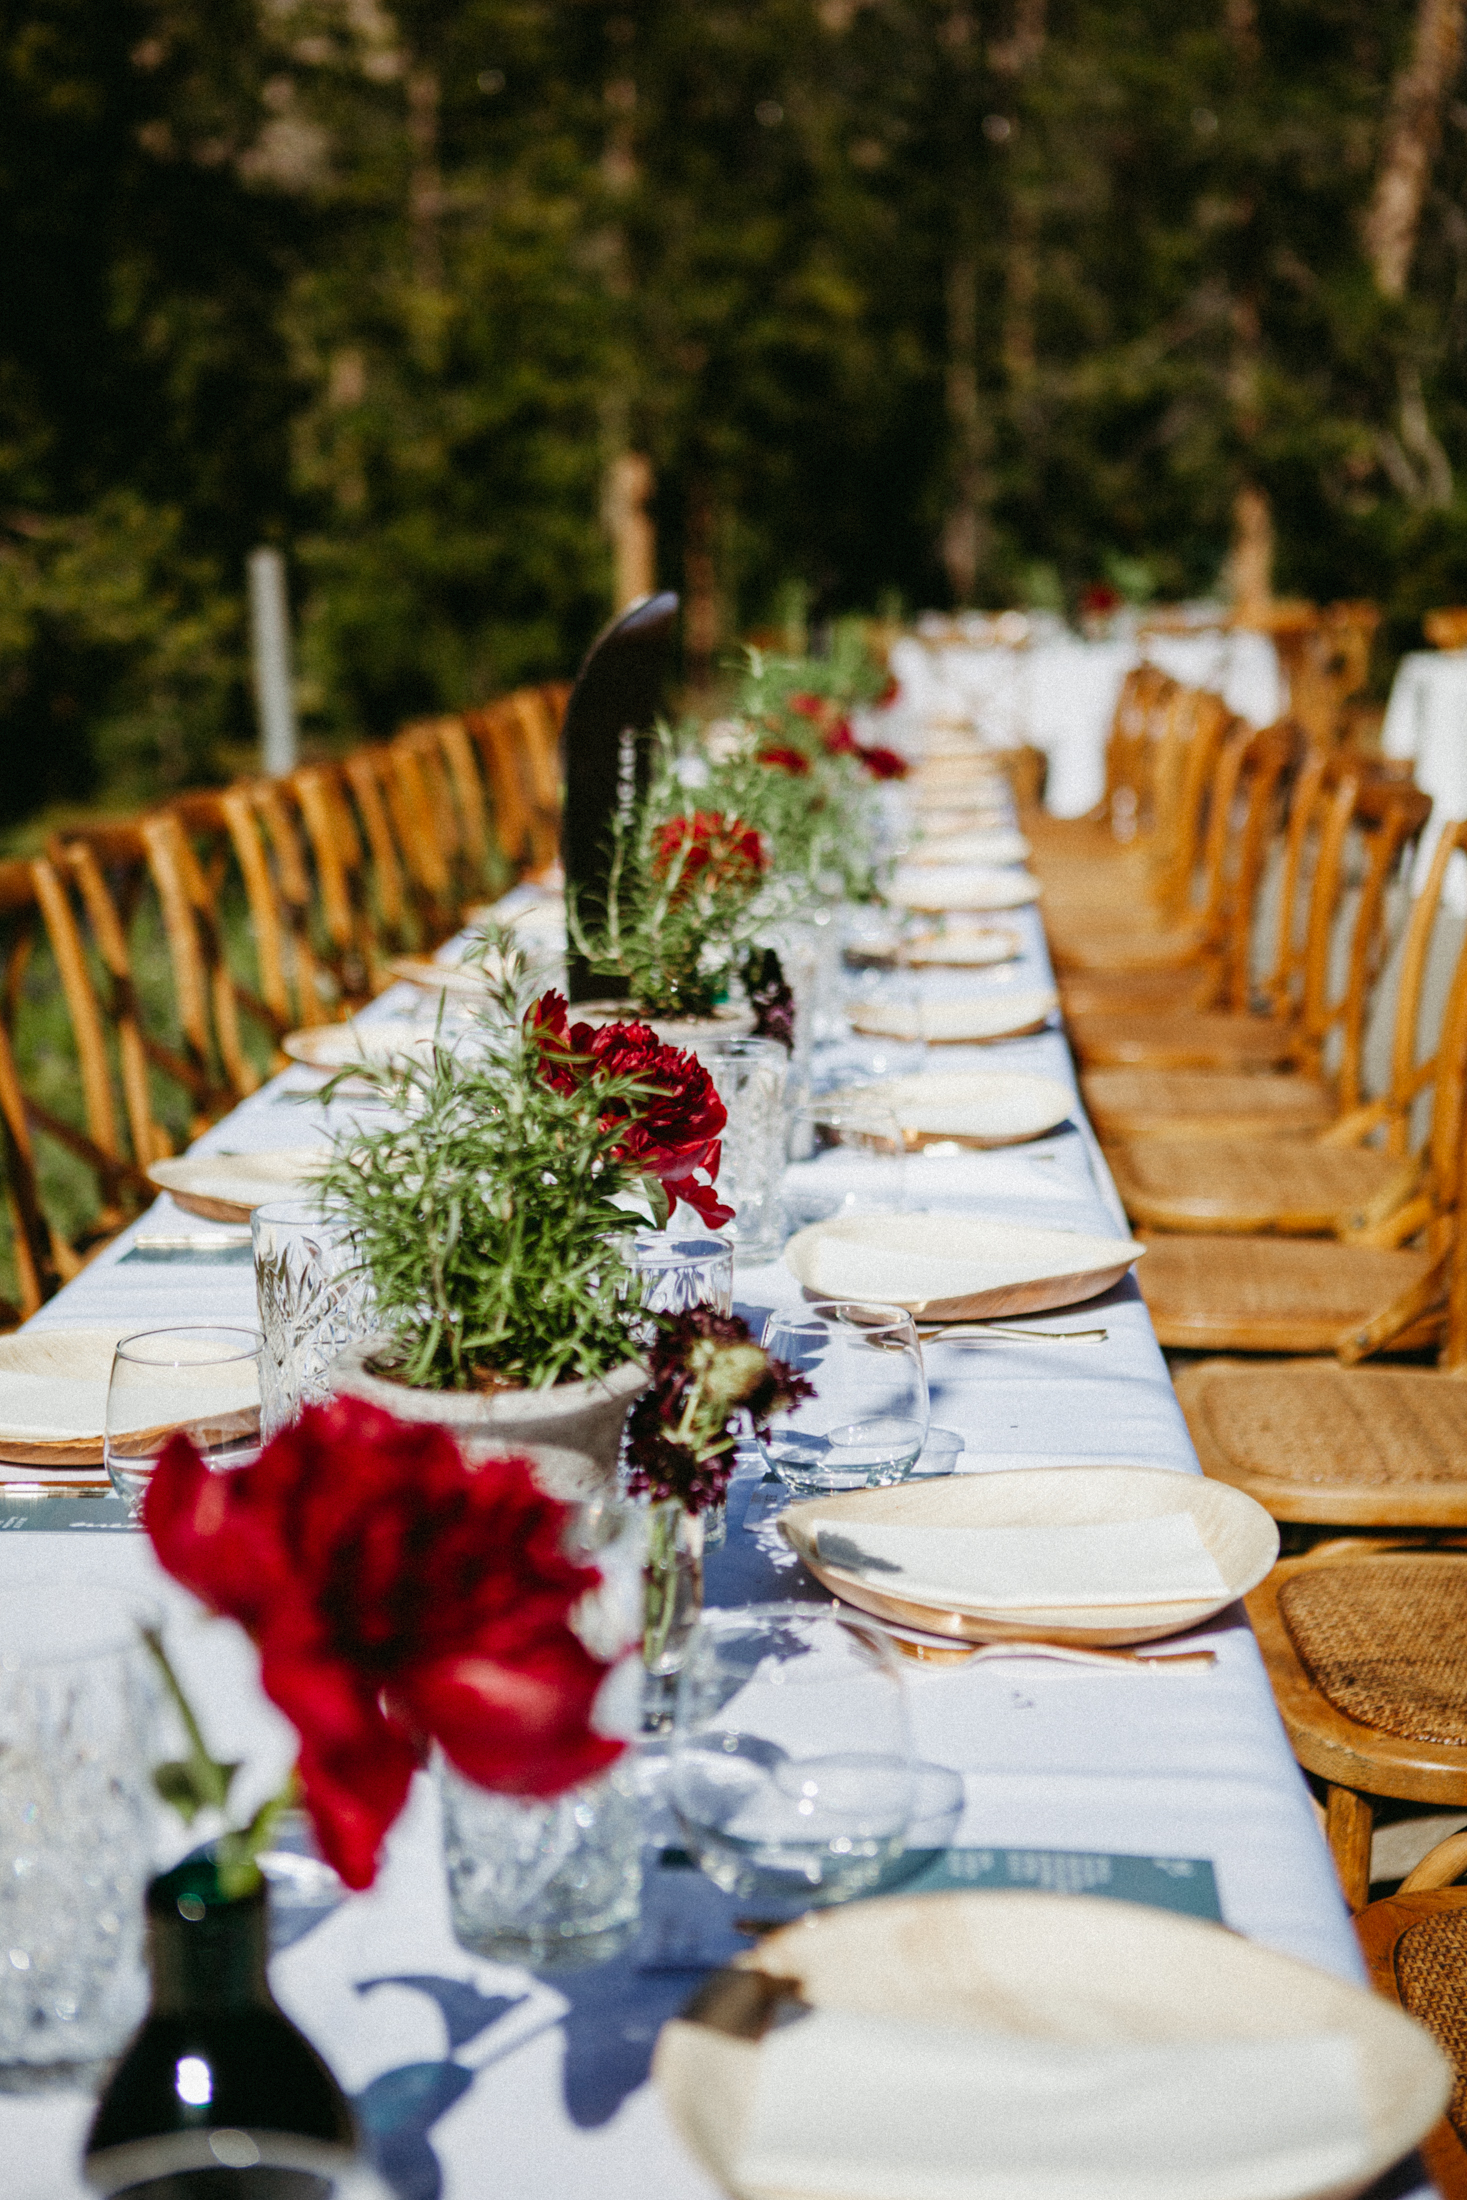 idaho-4h-camp-wedding-christinemarie-103.jpg